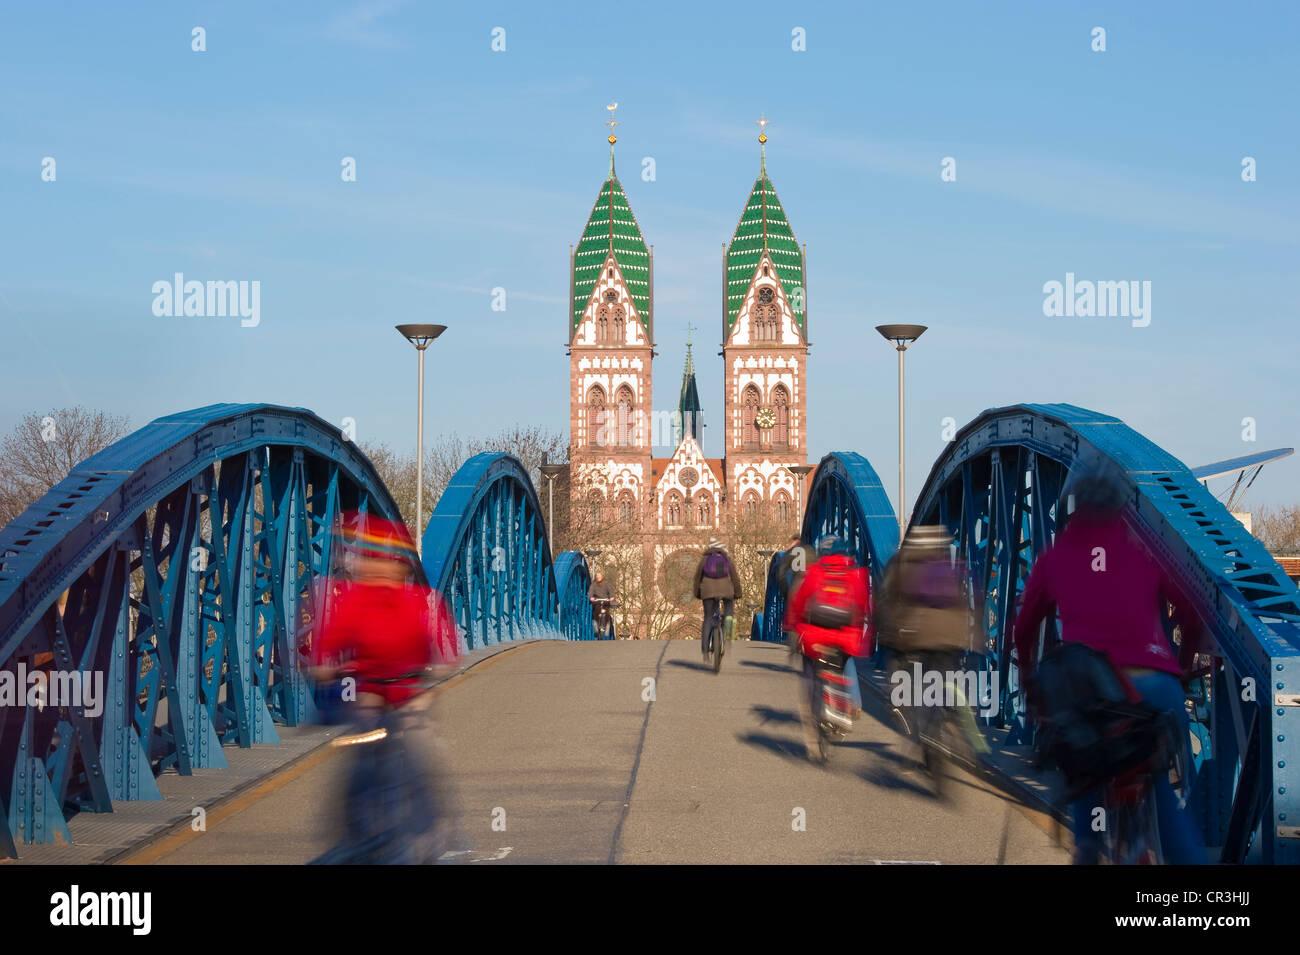 Blue Bridge and cyclists with motion blur, Freiburg im Breisgau, Black Forest, Baden-Wuerttemberg, Germany, Europe - Stock Image